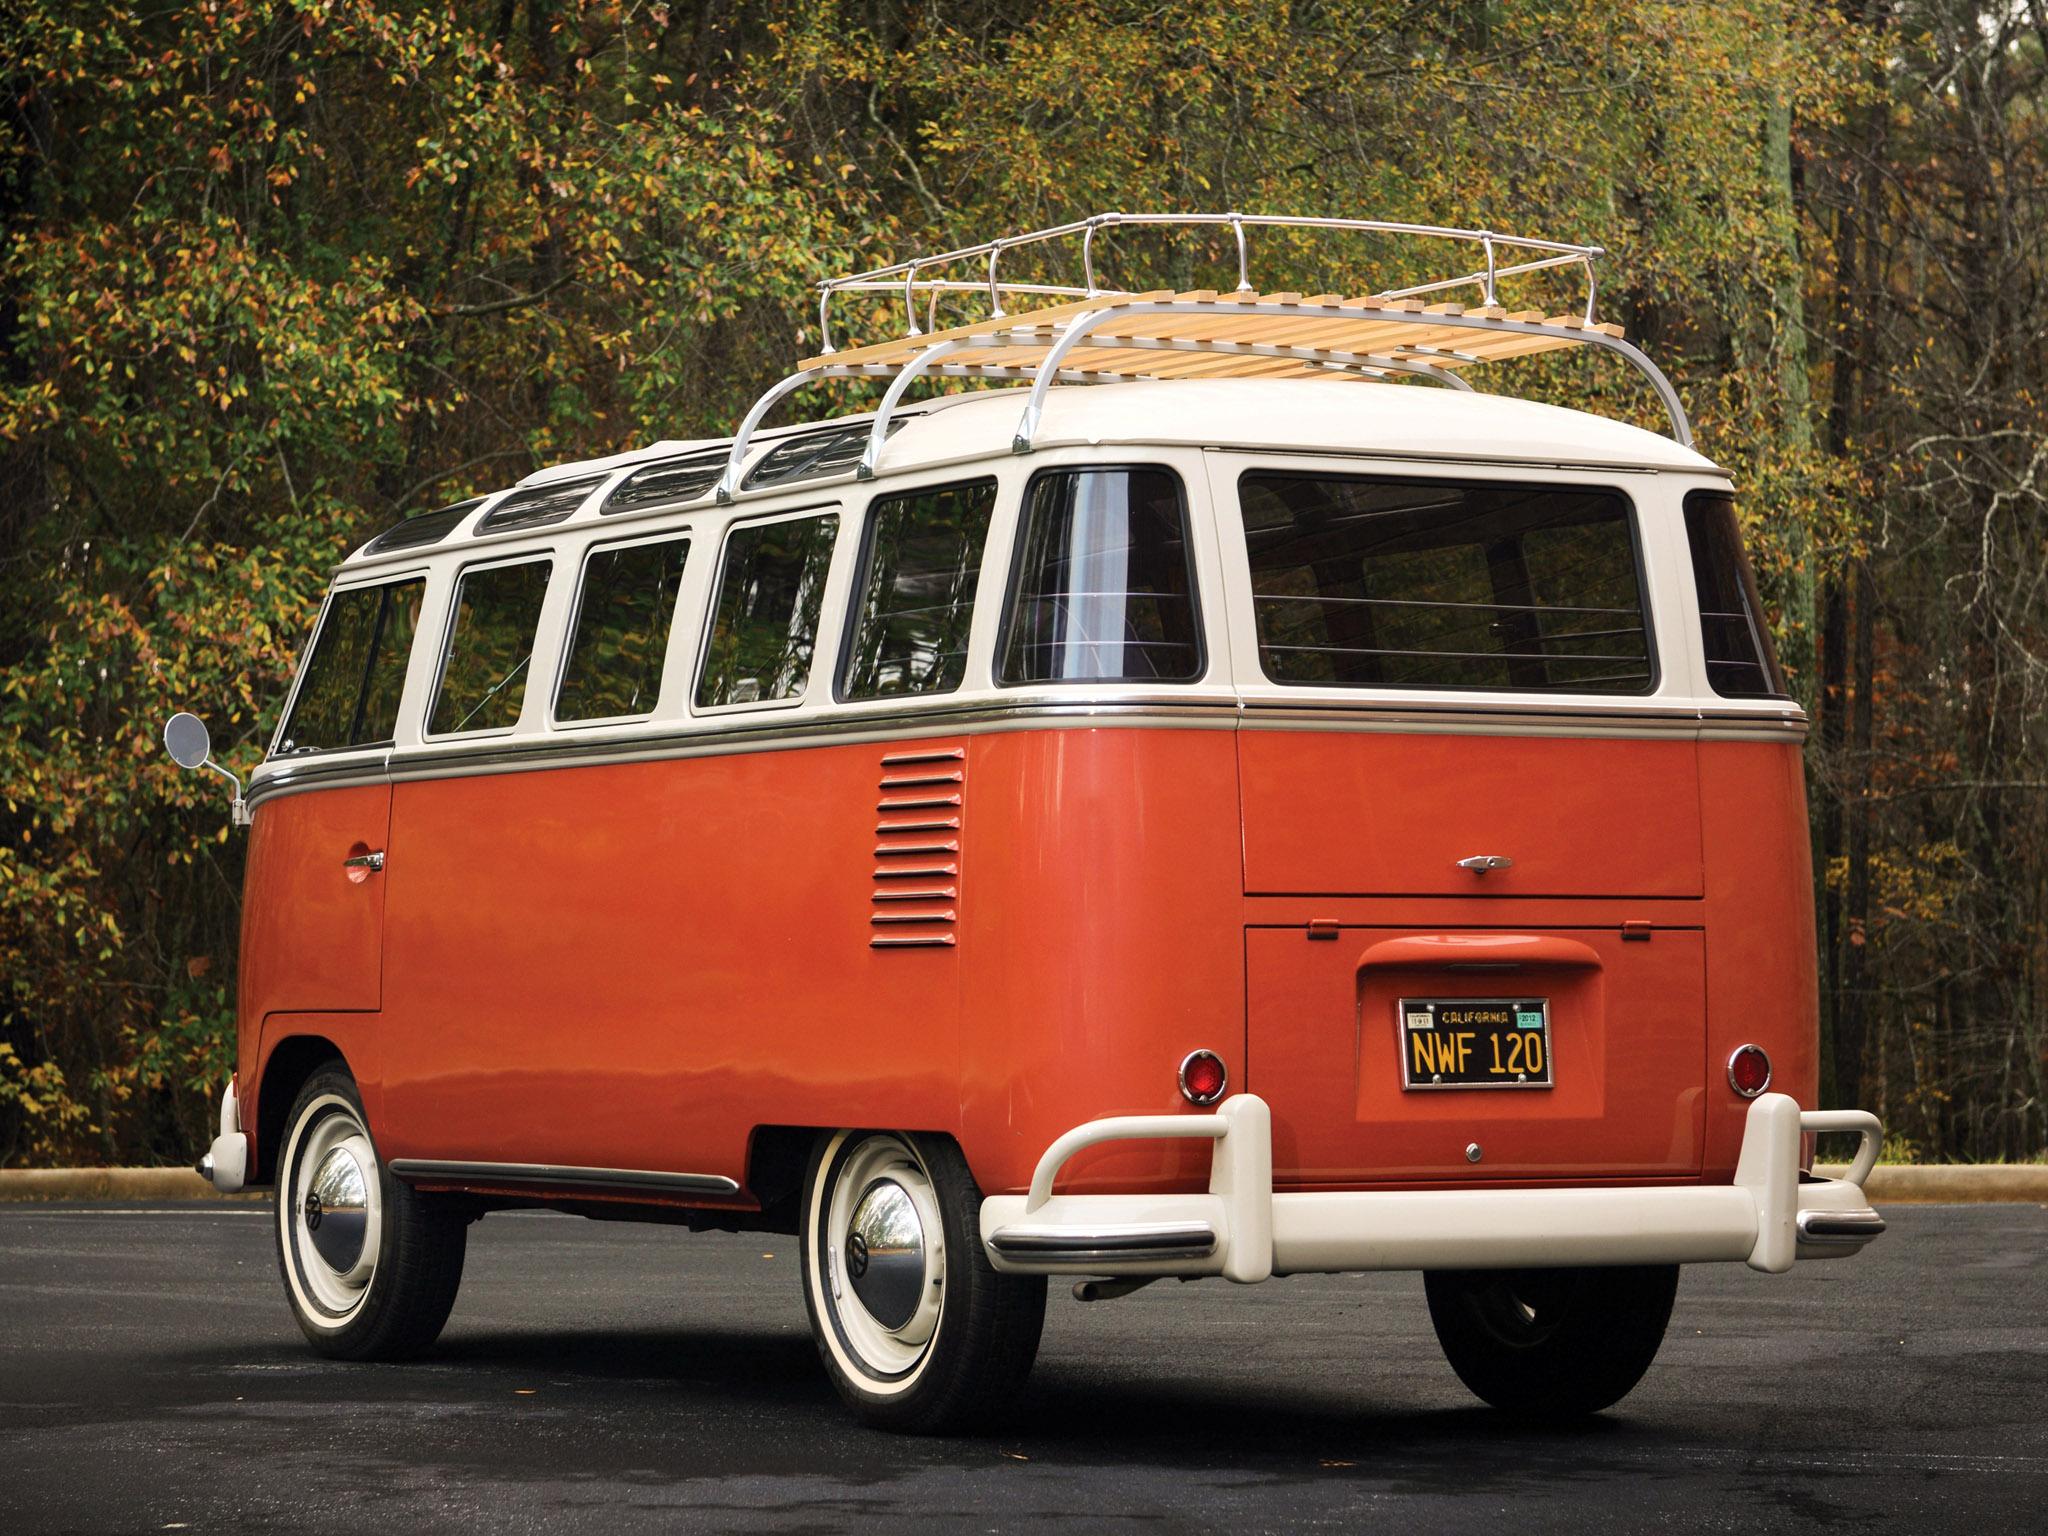 1951 volkswagen t 1 deluxe samba bus retro f wallpaper 2048x1536 187578 wallpaperup. Black Bedroom Furniture Sets. Home Design Ideas